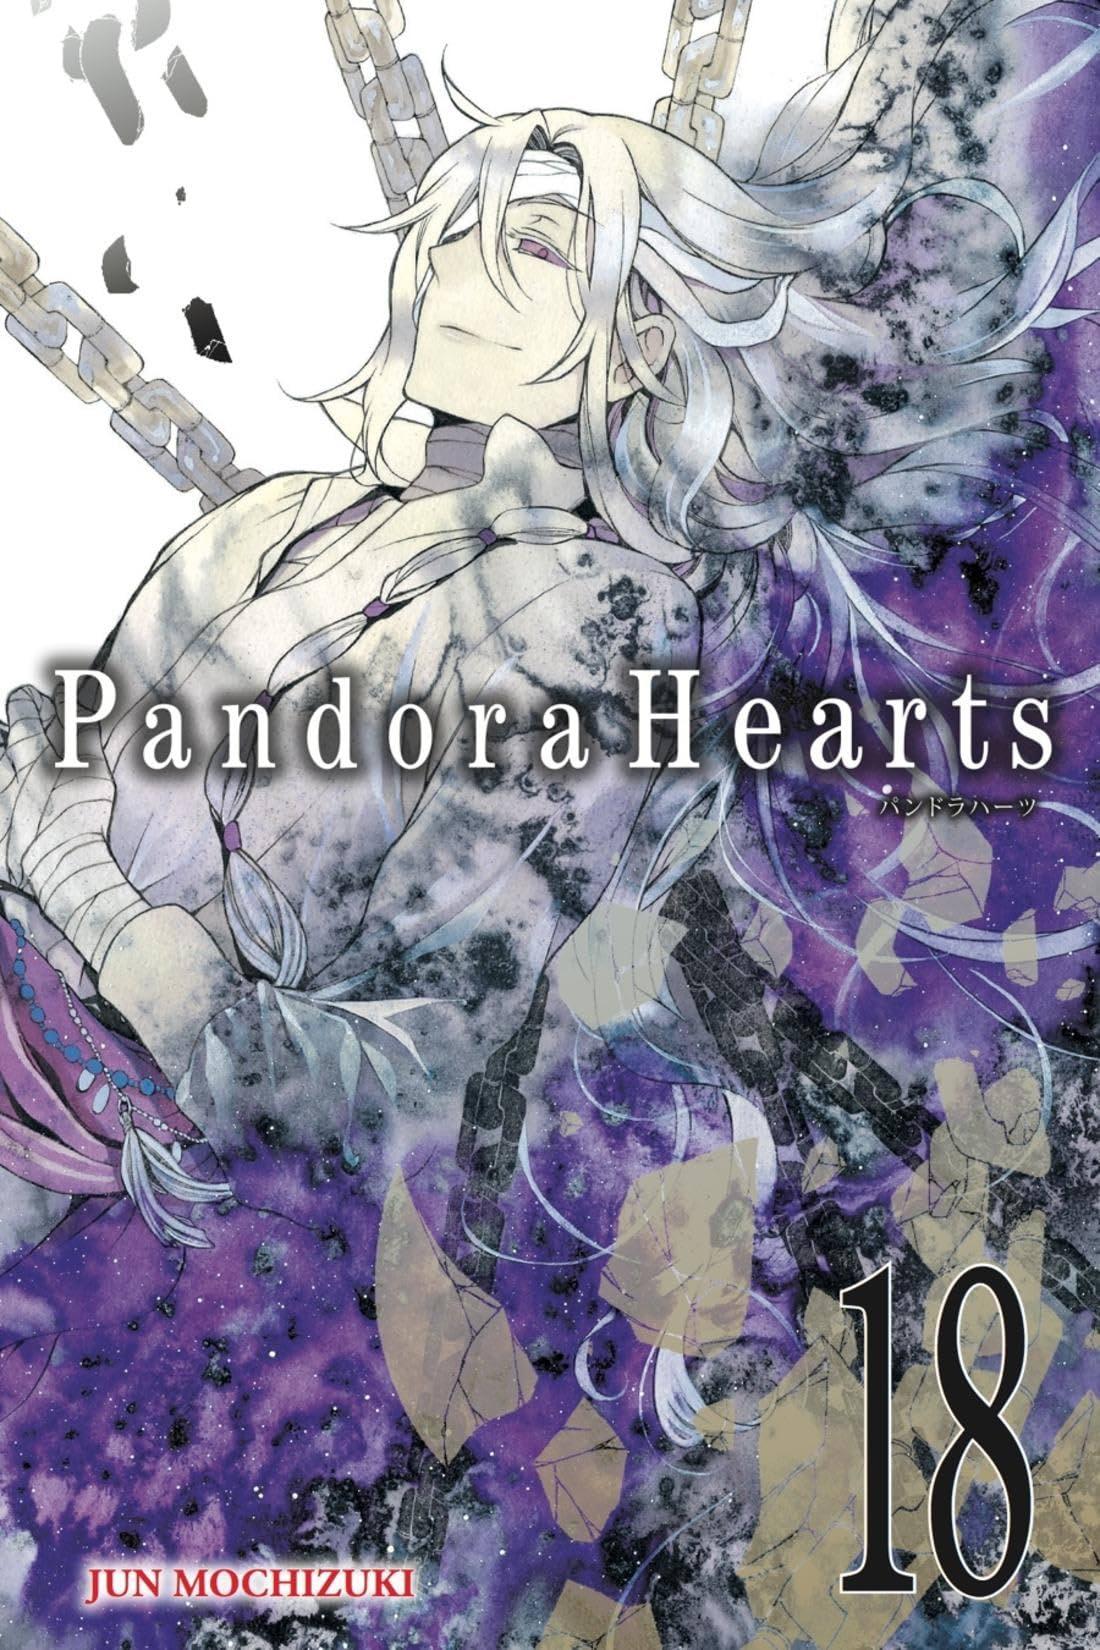 PandoraHearts Vol. 18